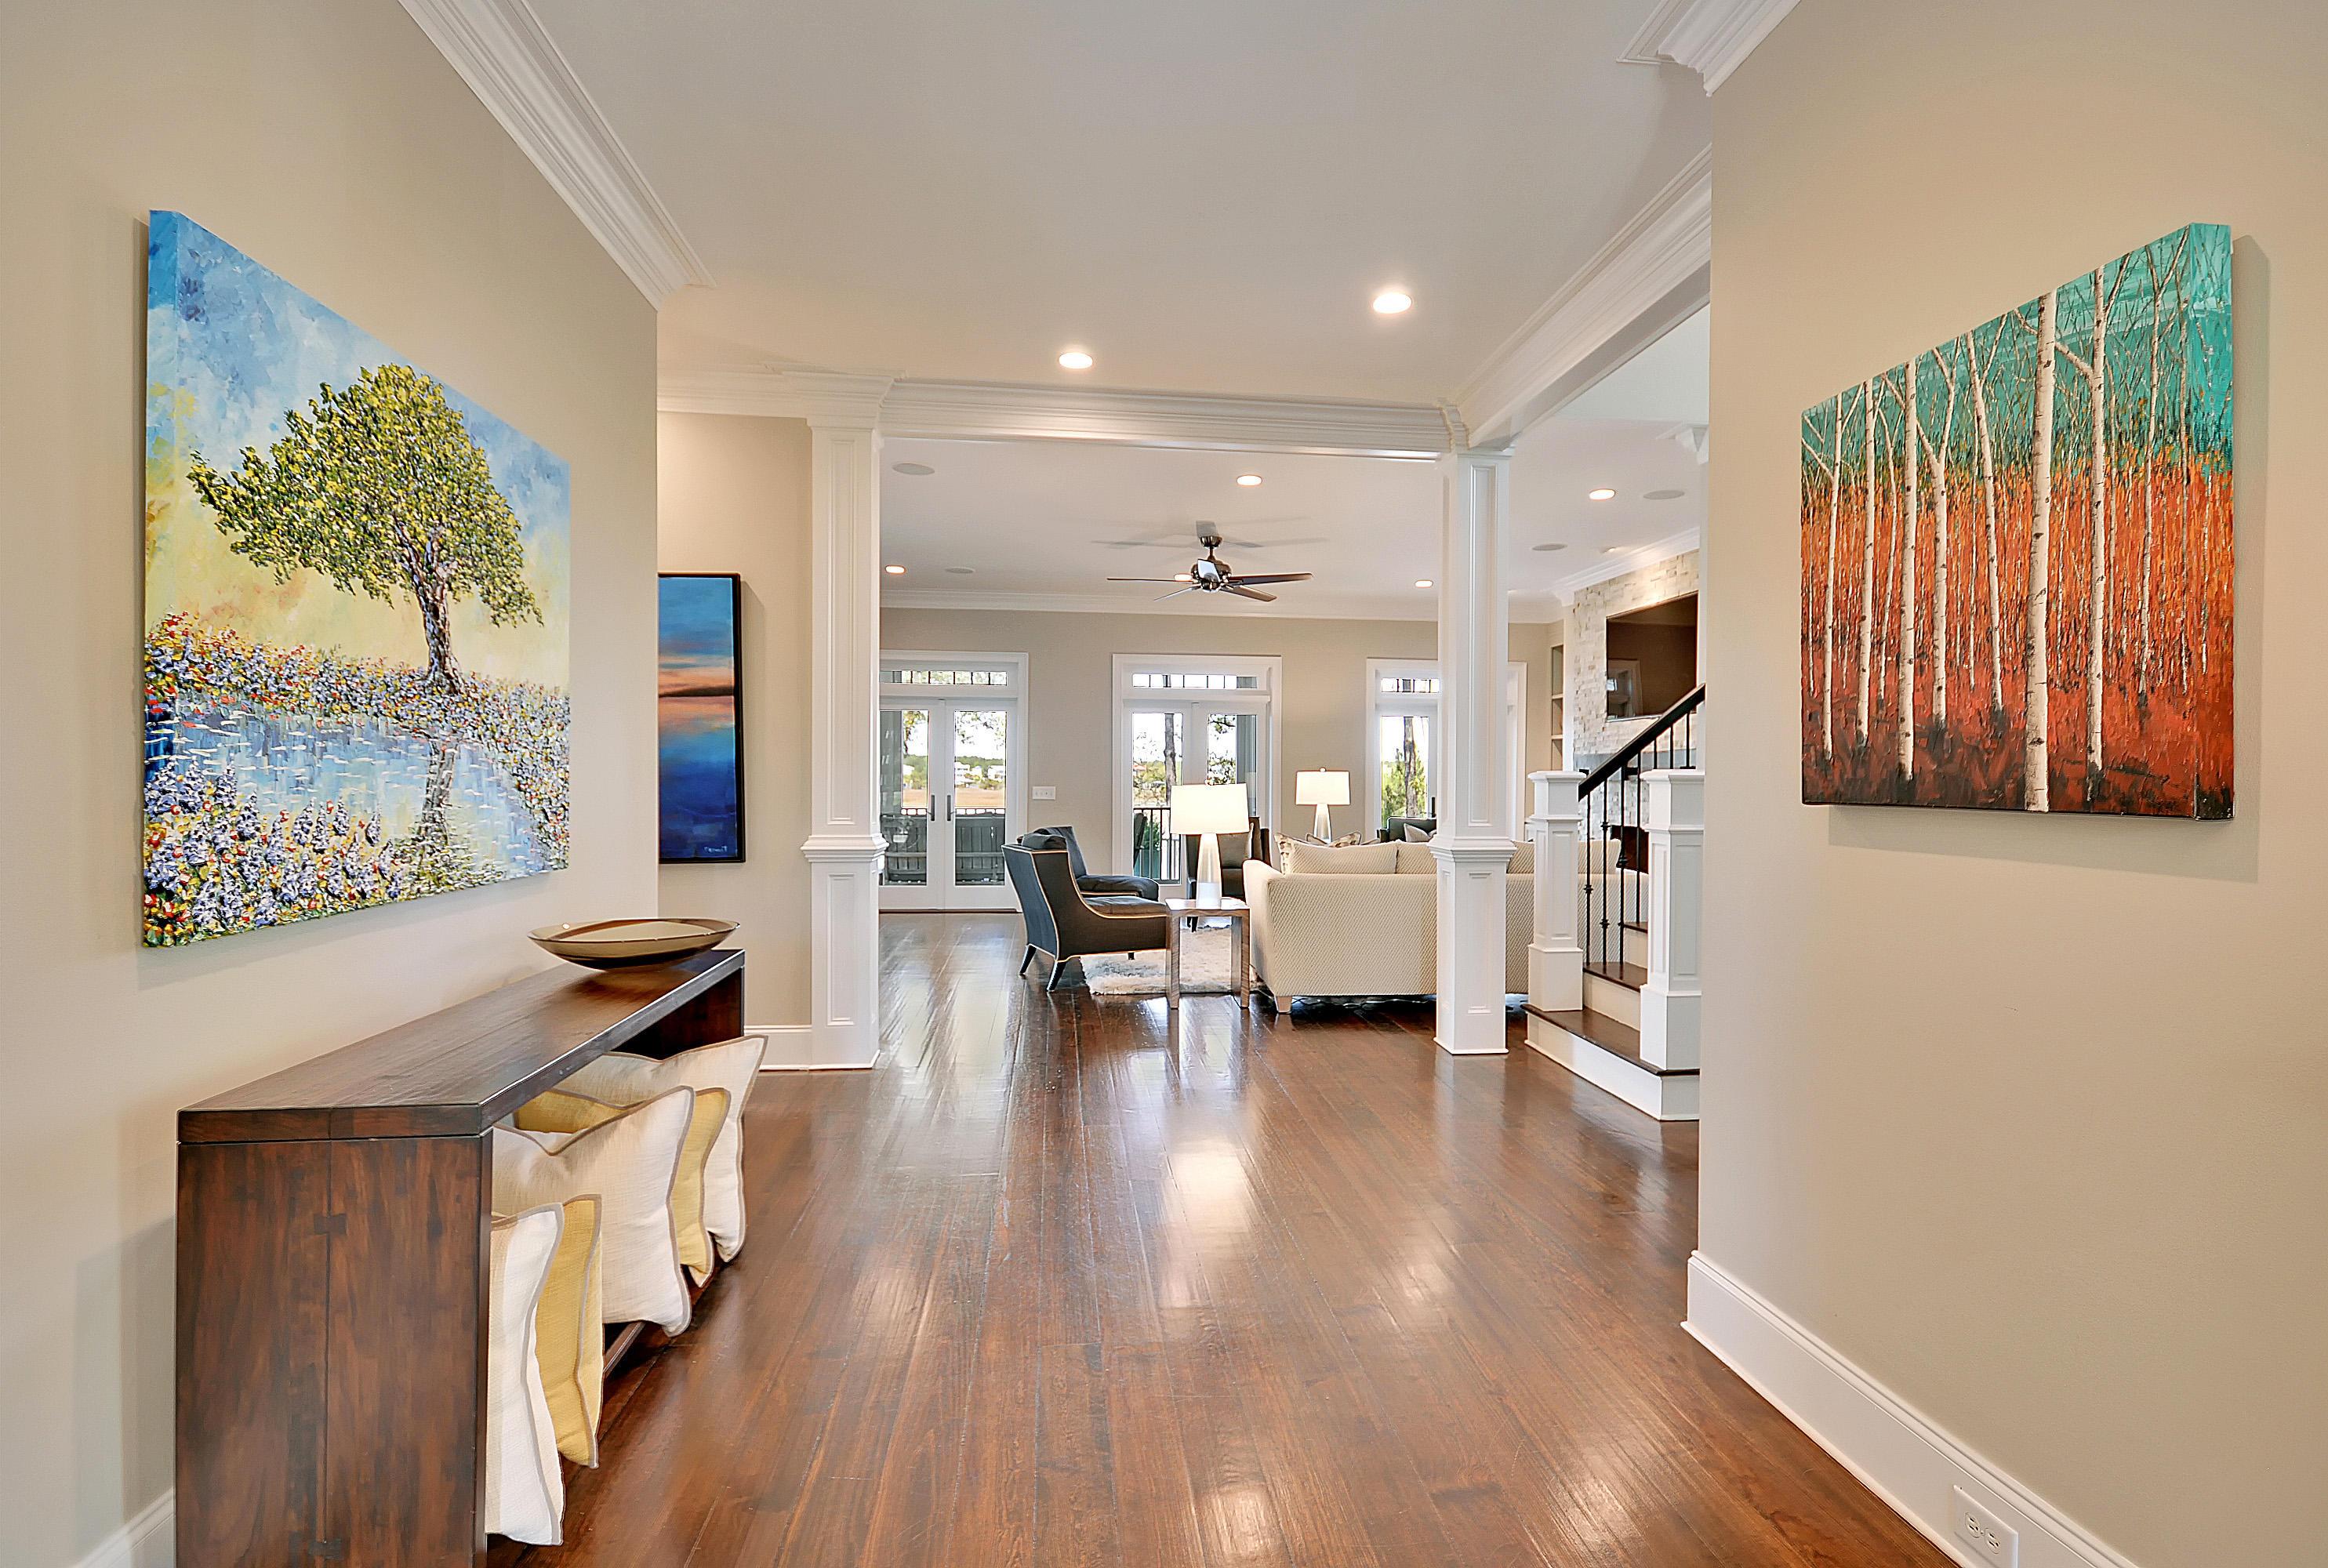 Daniel Island Homes For Sale - 41 Watroo, Charleston, SC - 55